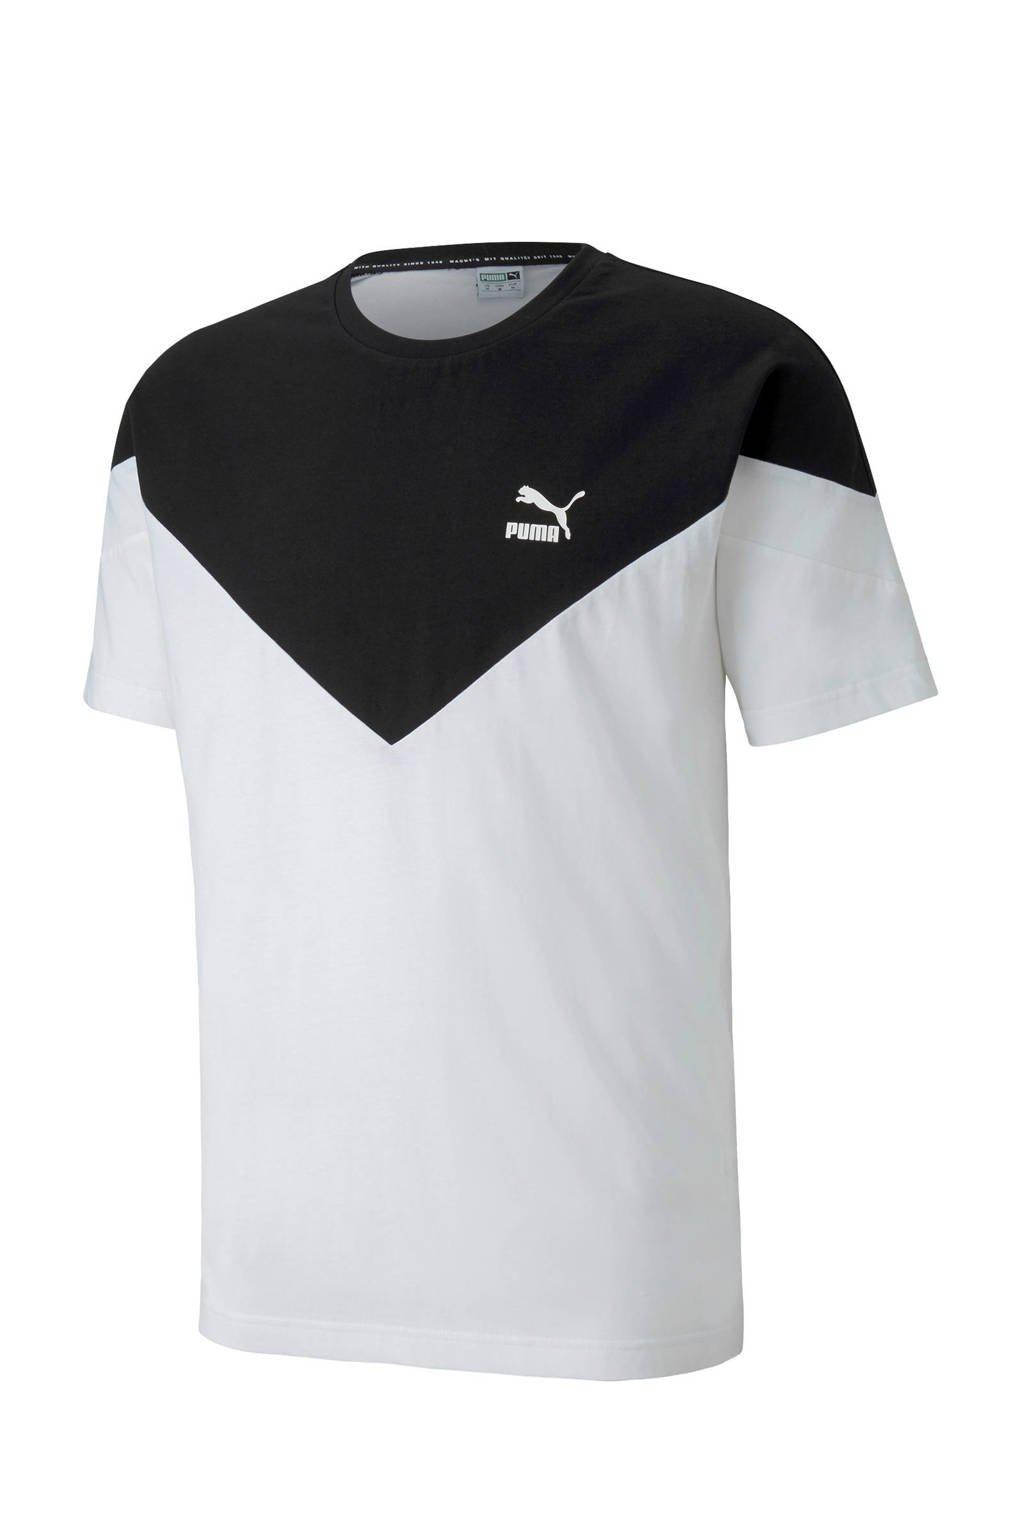 Puma   T-shirt wit/zwart, Wit/zwart